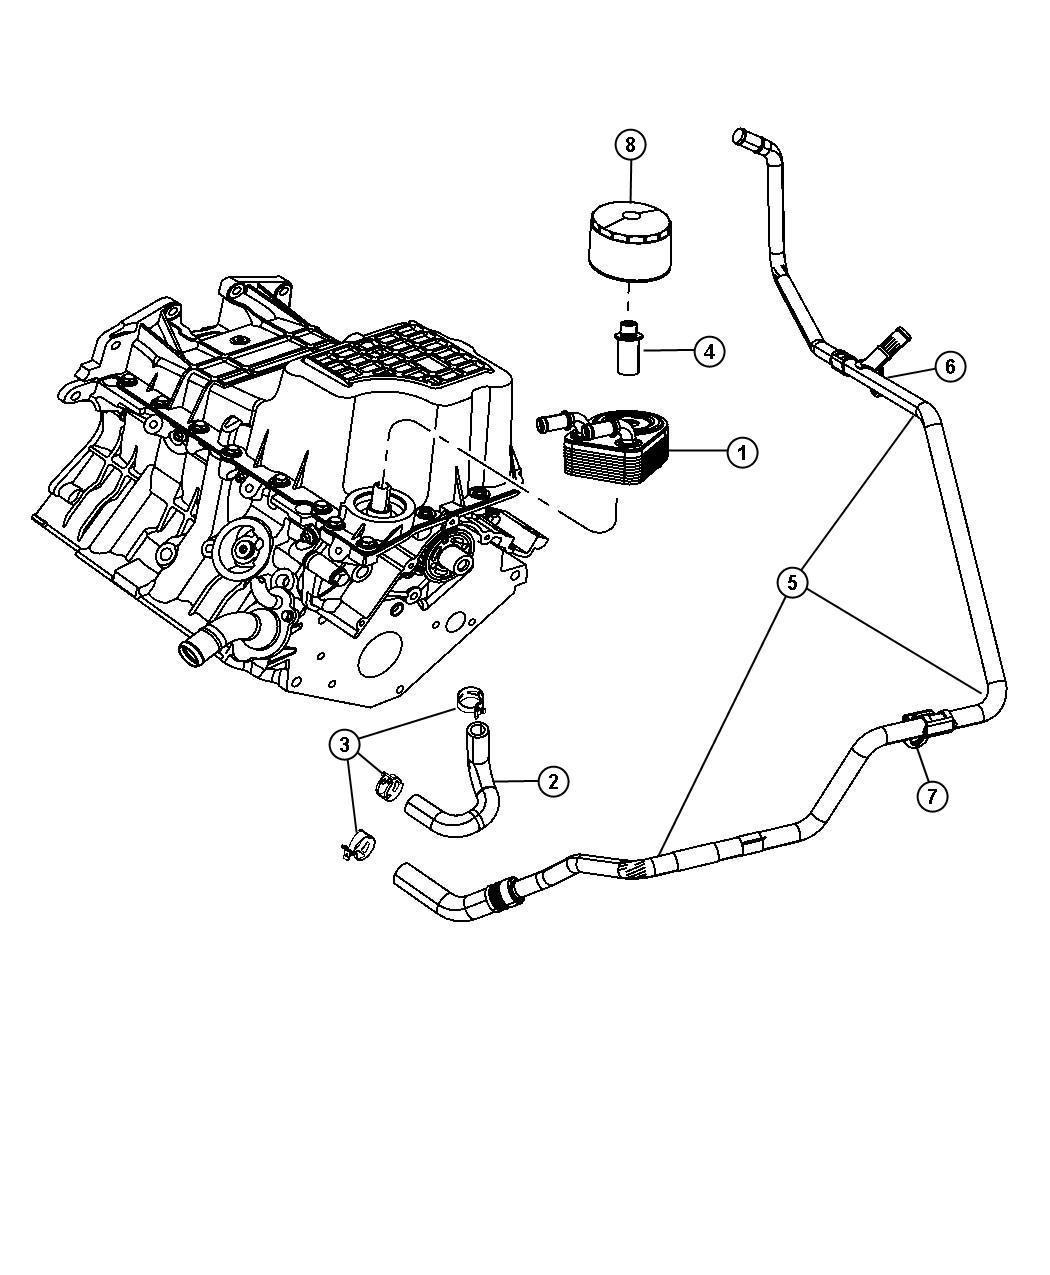 Dodge Grand Caravan Cooler Engine Oil Used On